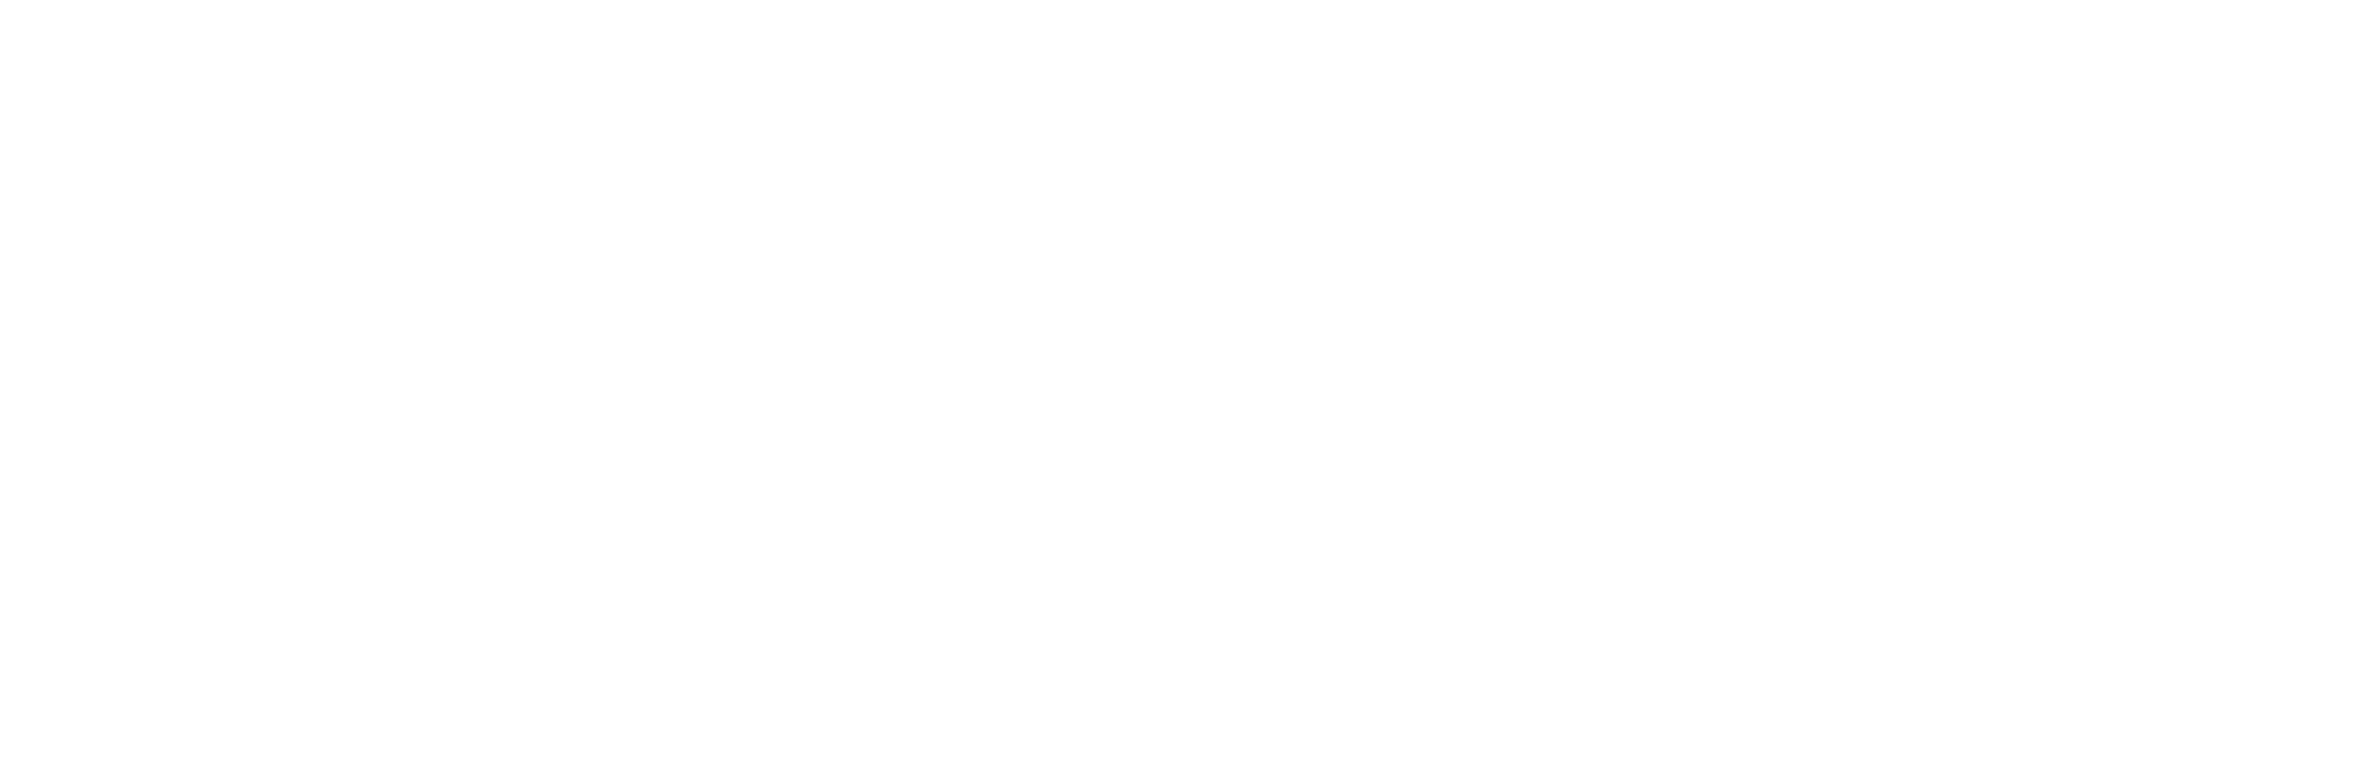 logo_PROEDUCA negativo-01